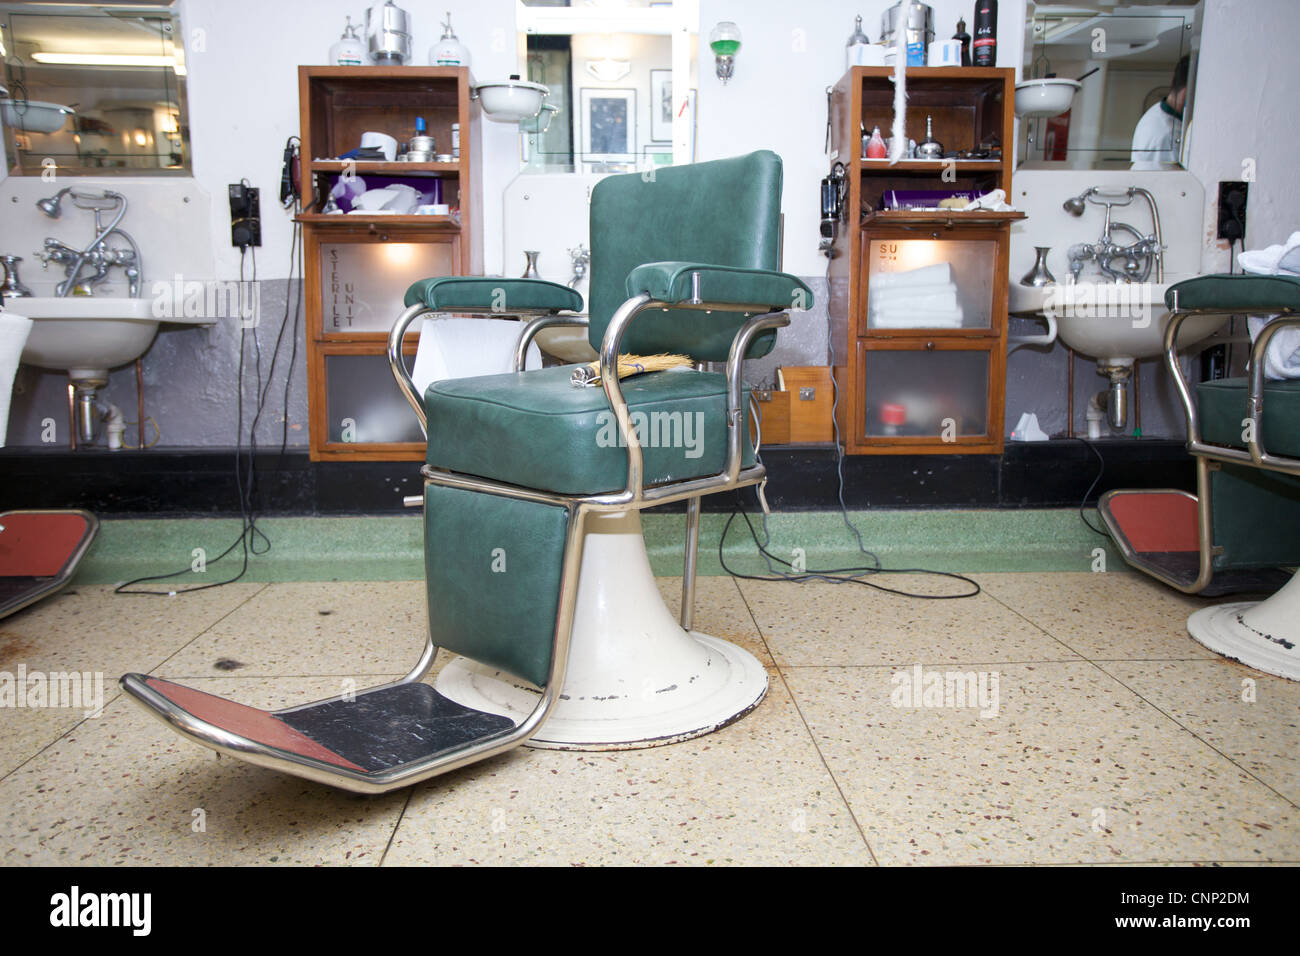 Uncategorized barber chair the legacy of koken barber chairs antique barber chairs -  Craigslist Vintage Barber Chairs By Vintage Barber Chair Vector